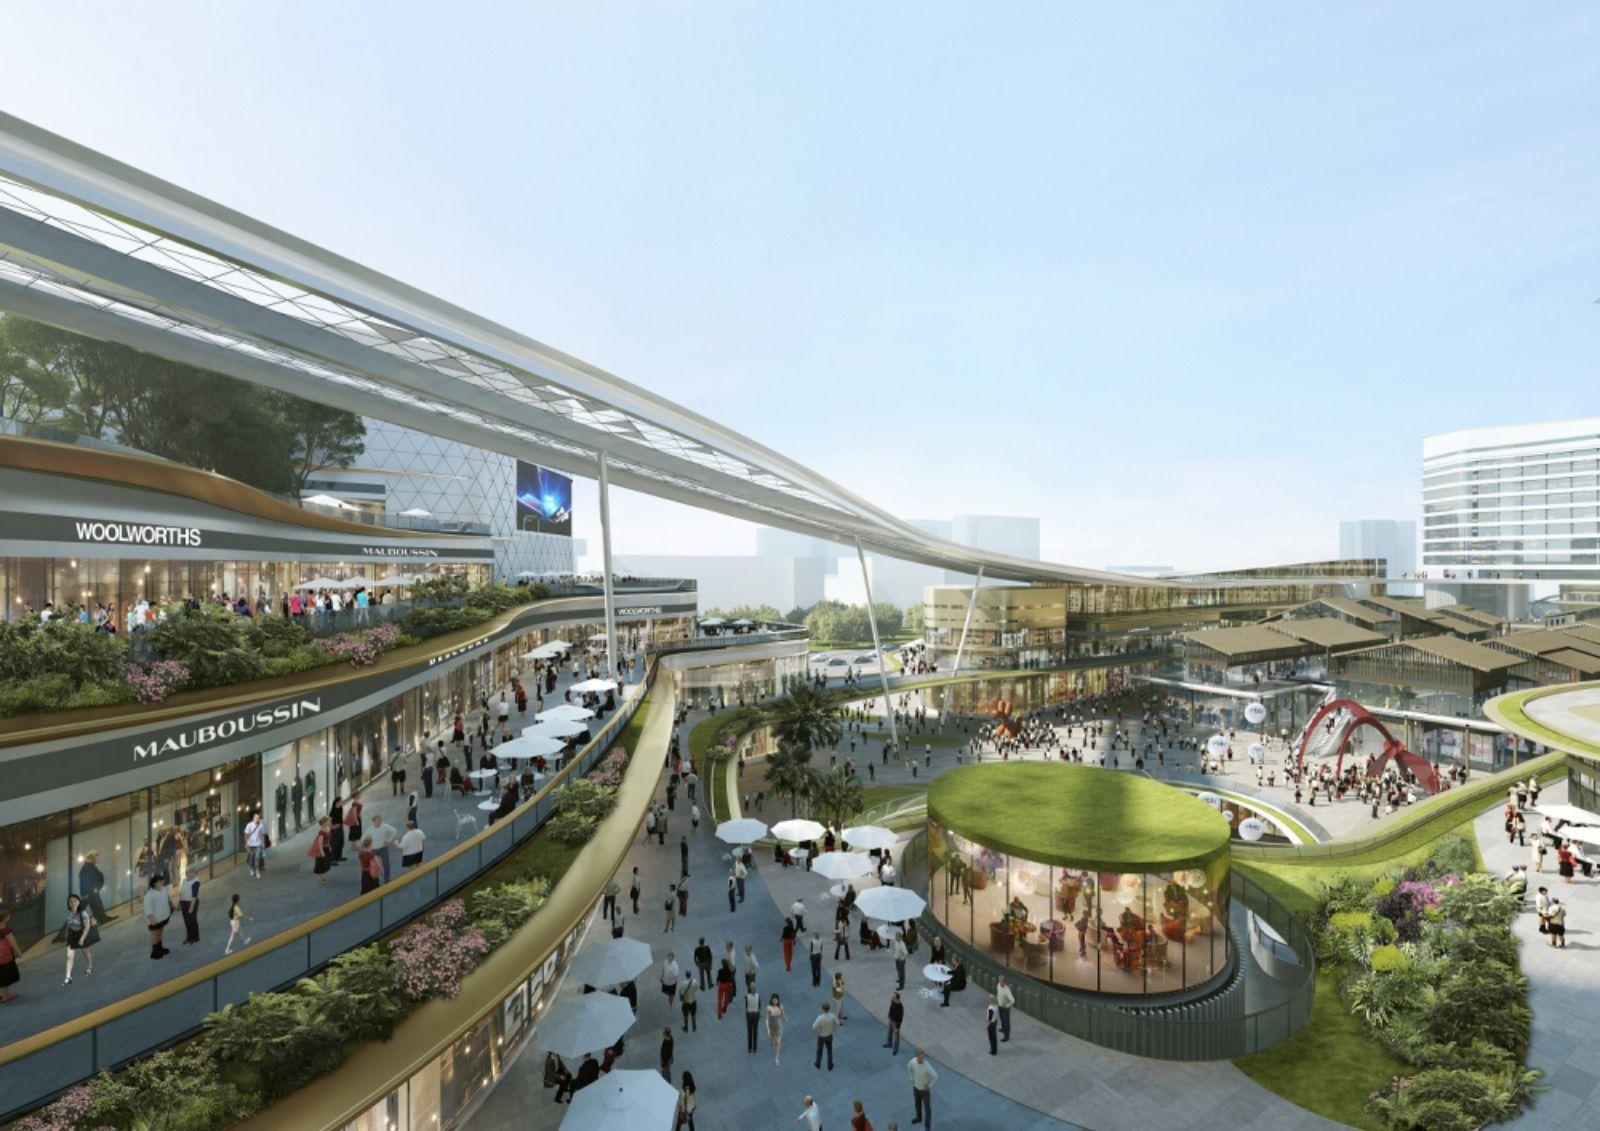 Sanya Integrated Commercial and Transportation Hub